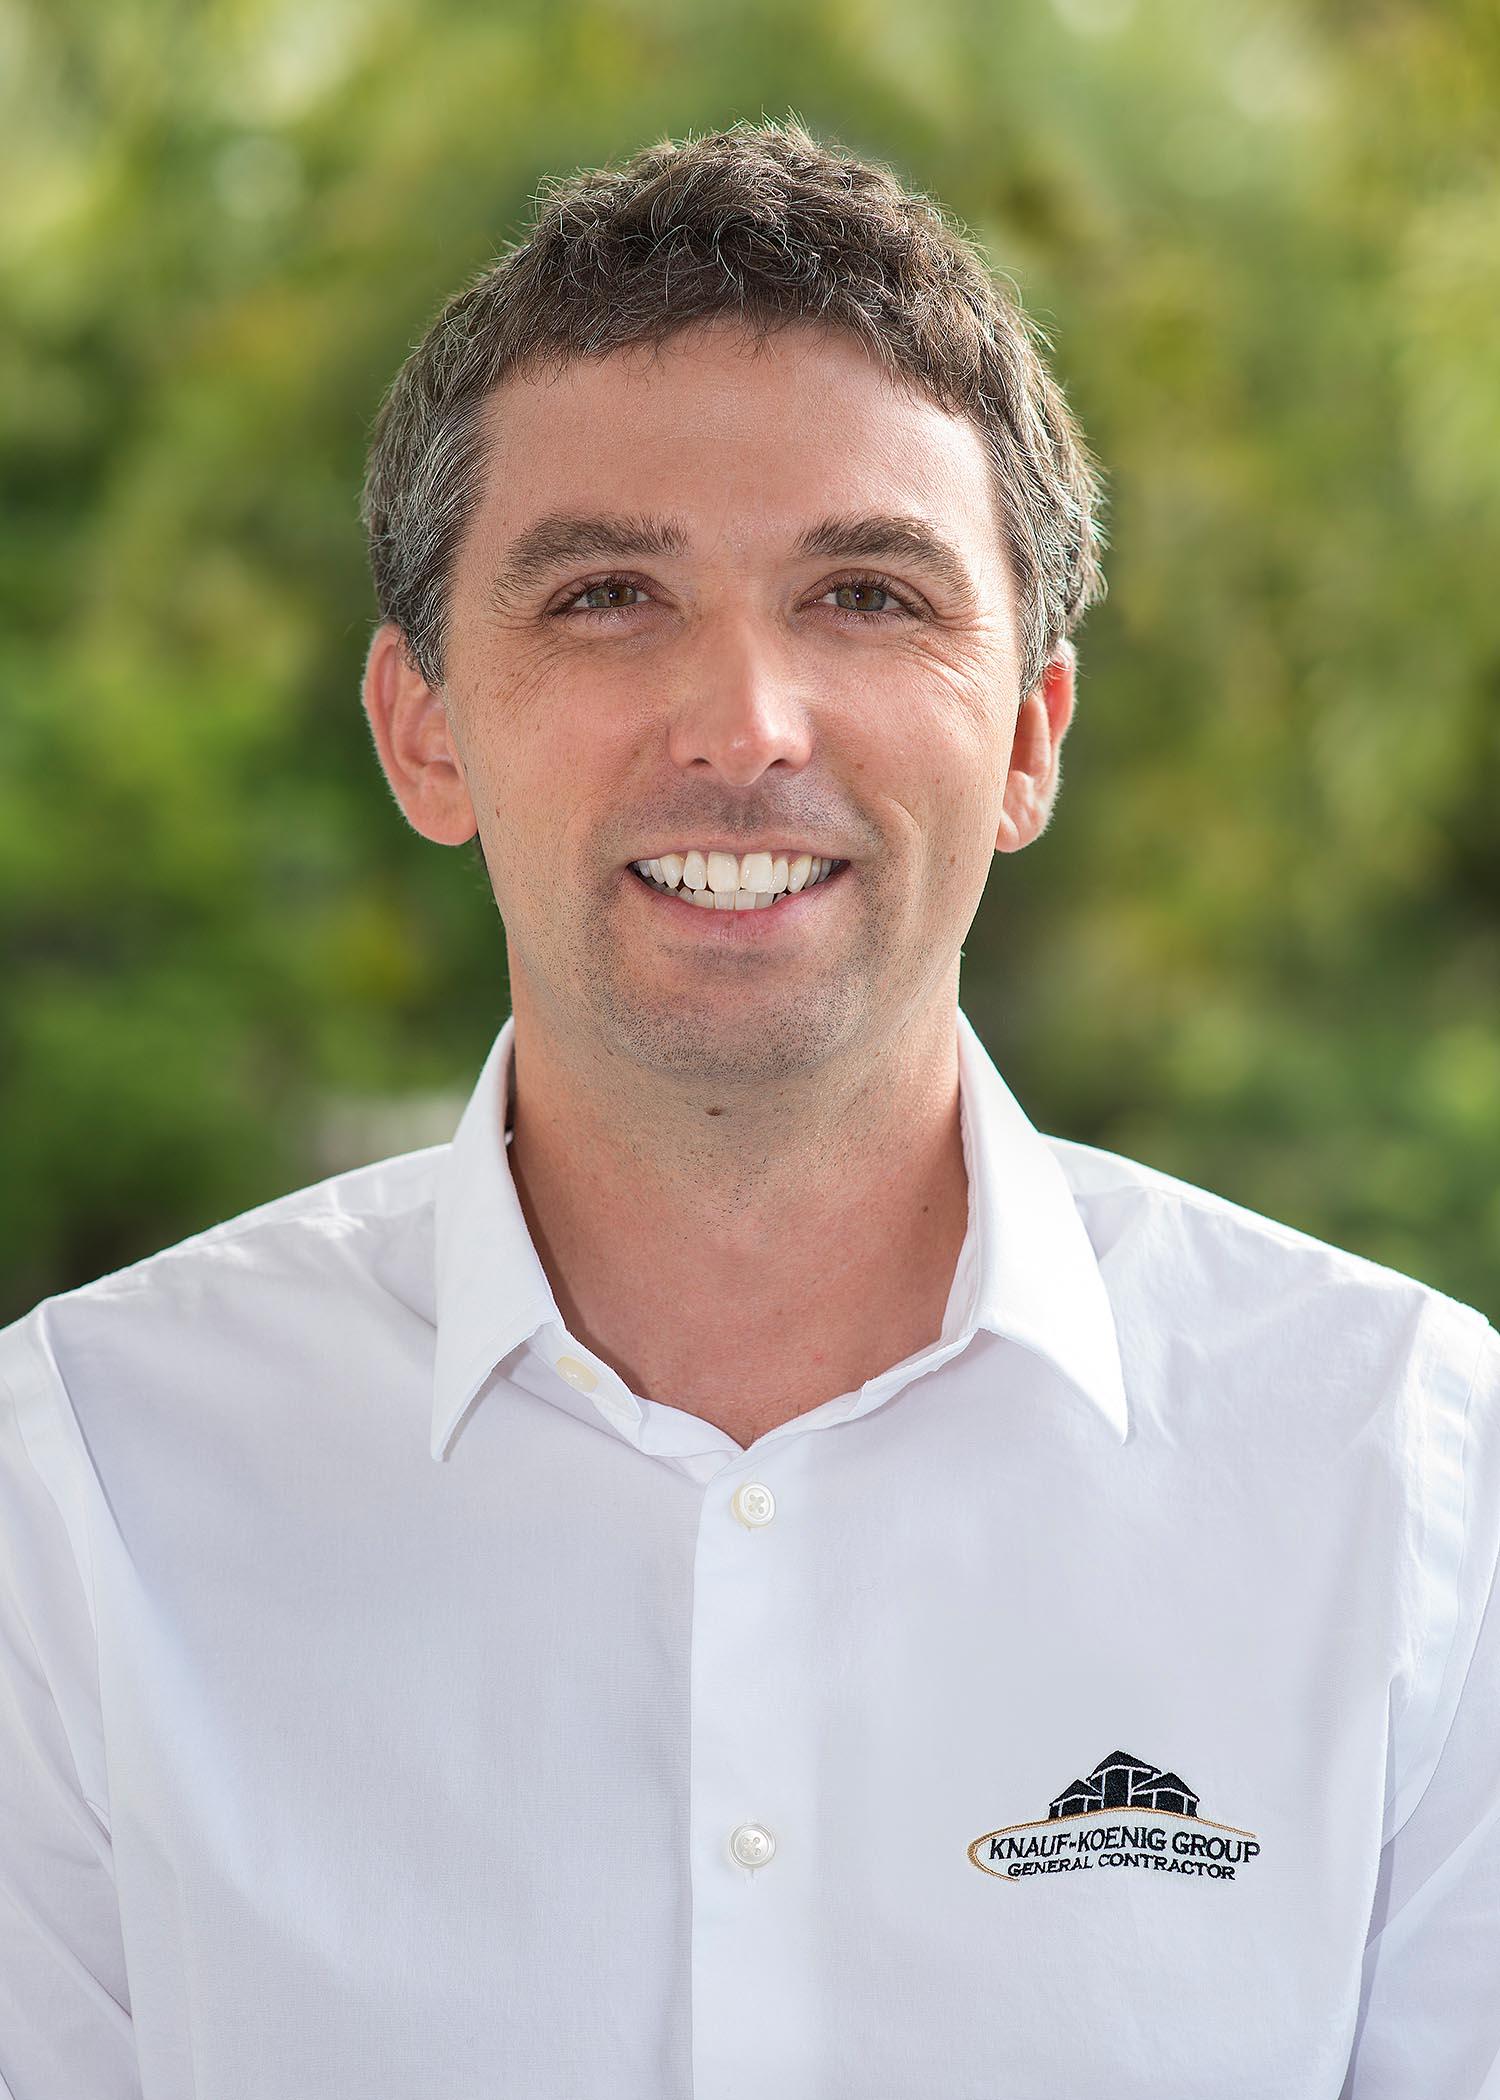 Nick Raddick | Knauf-Koenig Group - Naples, Florida General Contractor